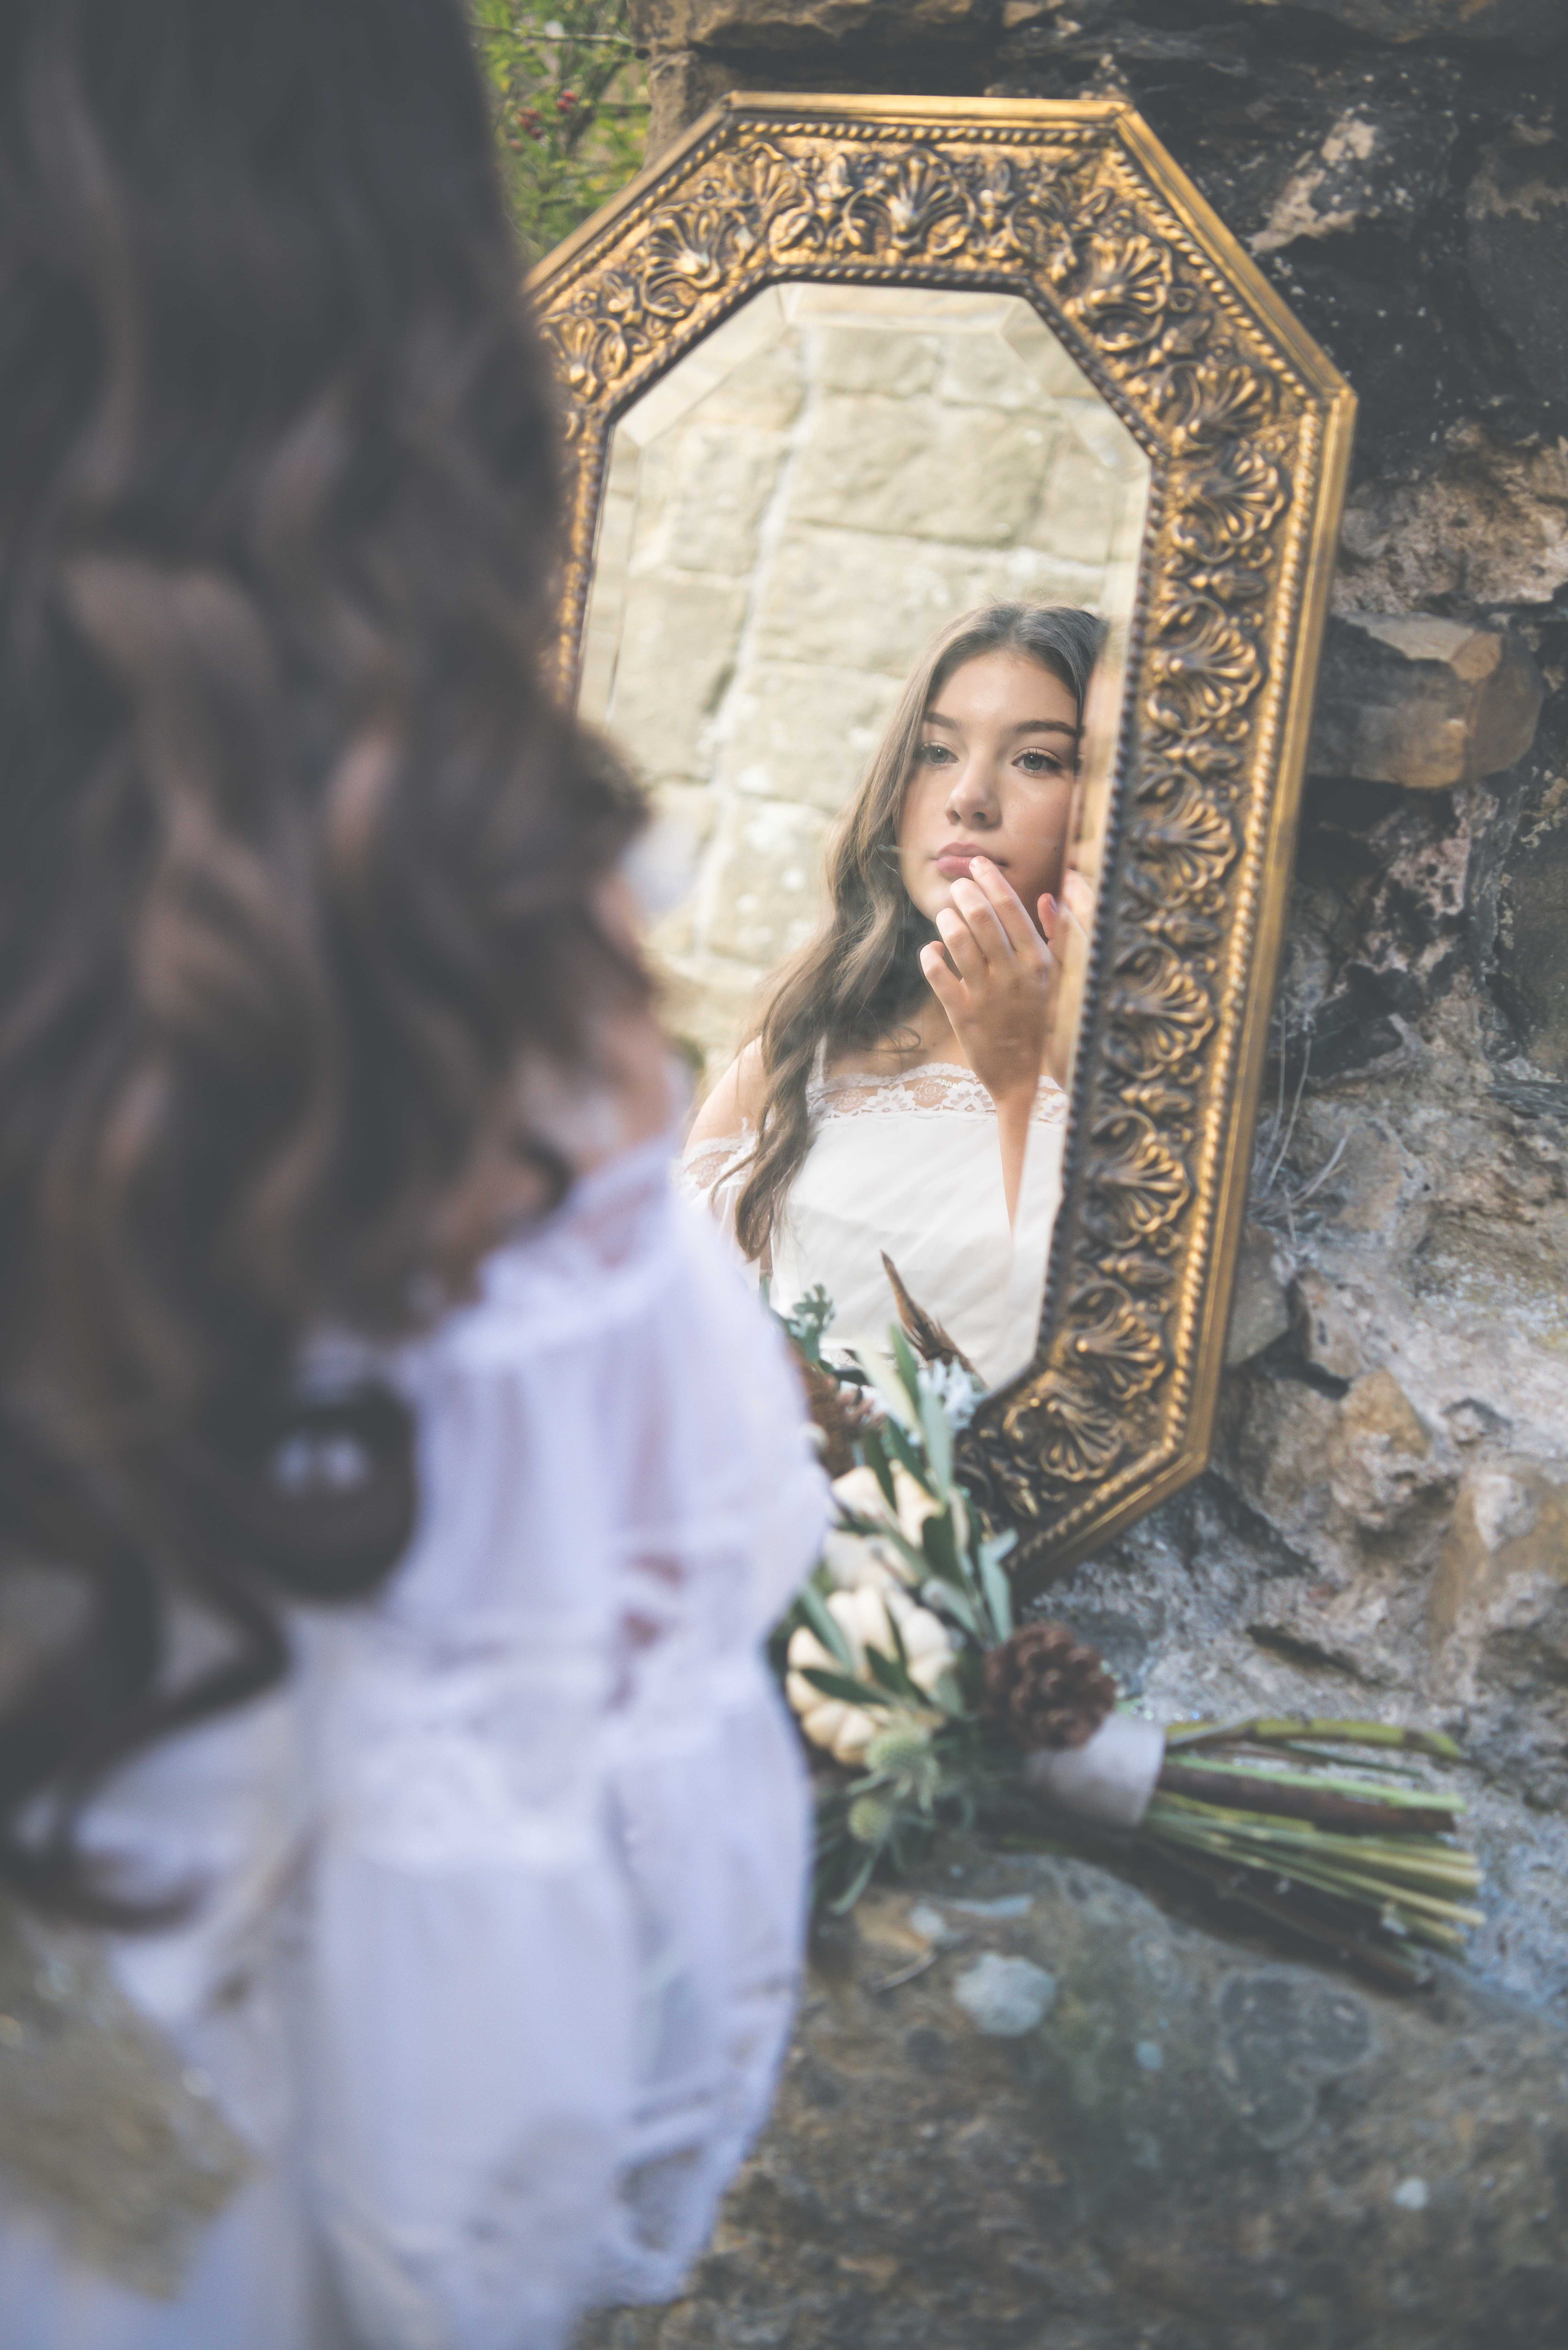 Live your own fairytale wedding - BexBrides - Jervaulx-0642